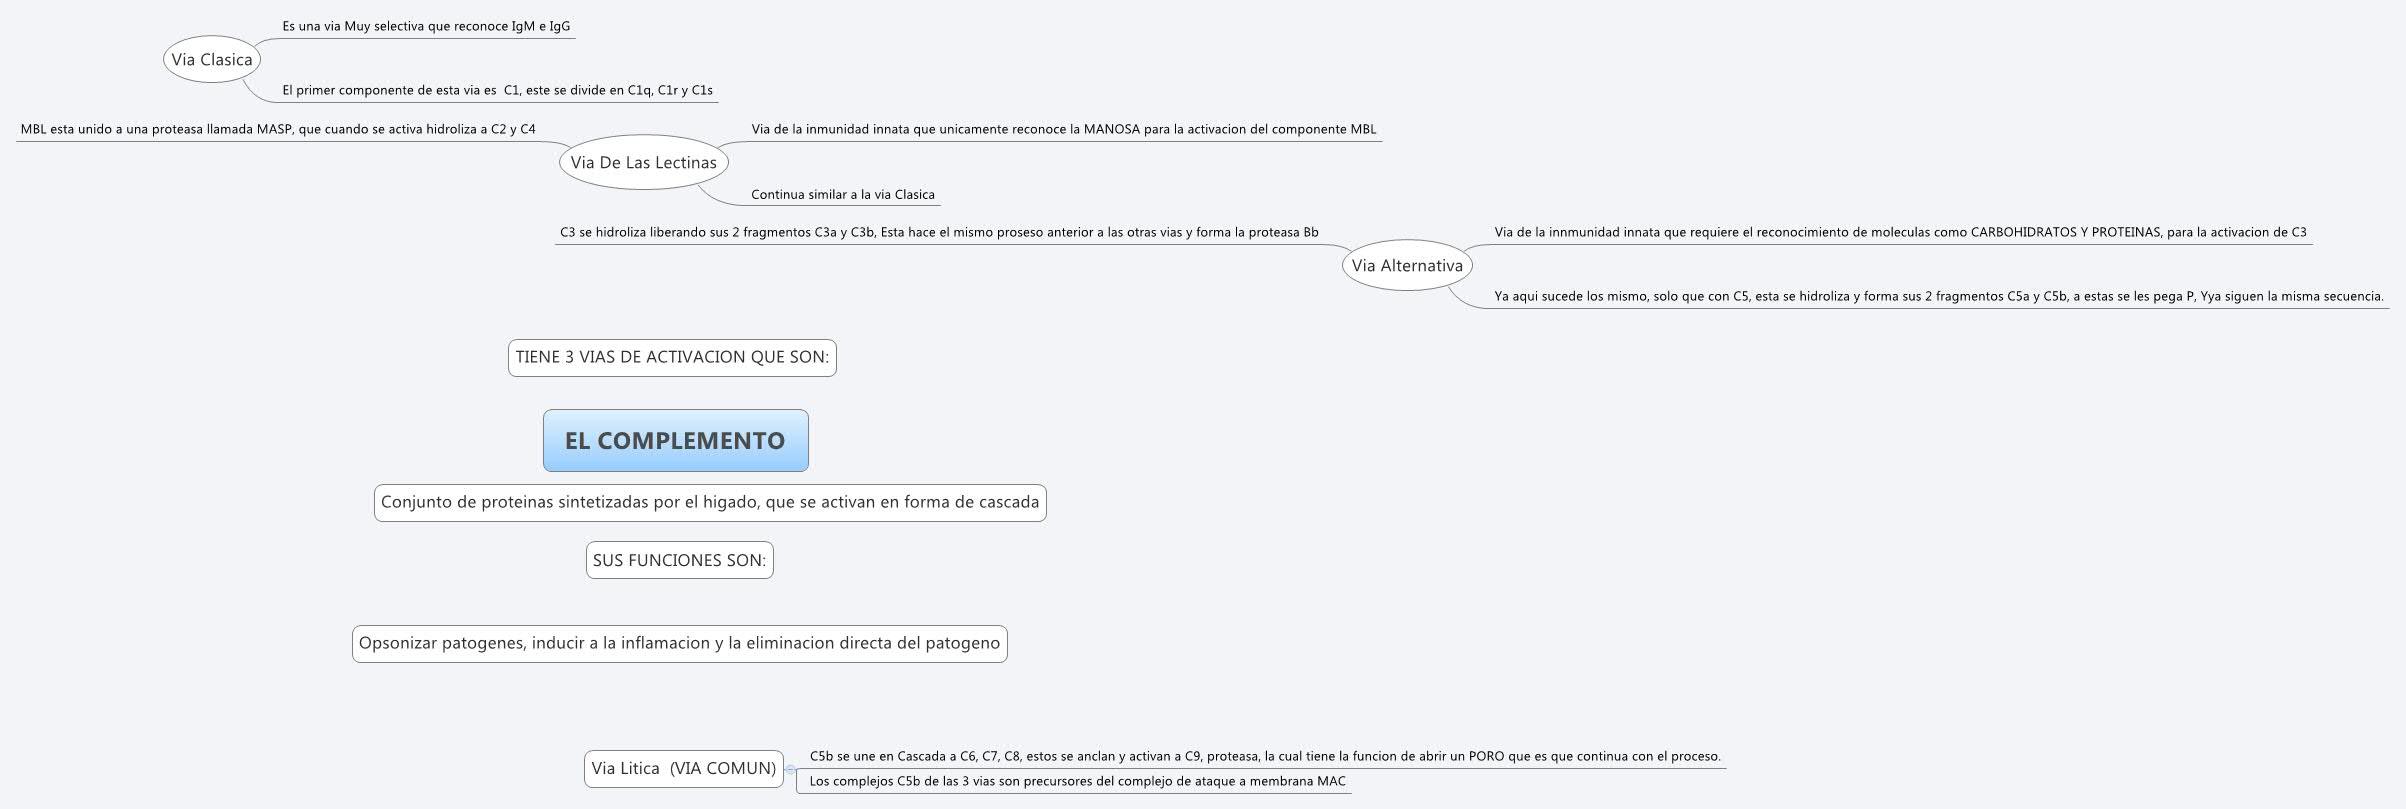 EL COMPLEMENTO -- XMind Online Library